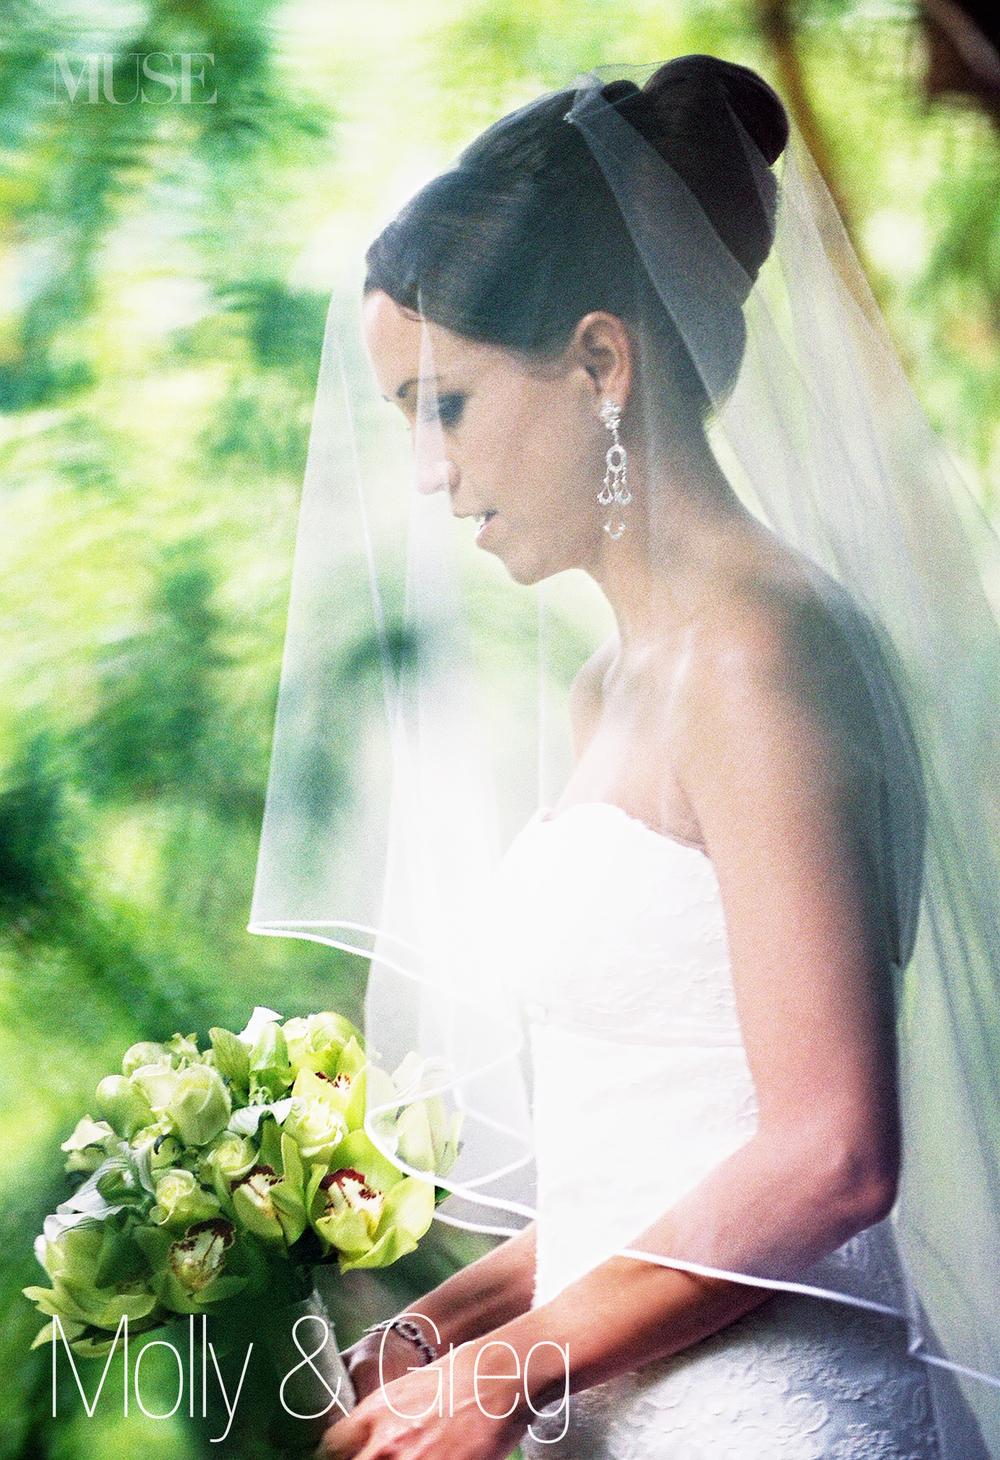 MUSE Bride - Kauai Wedding Portrait